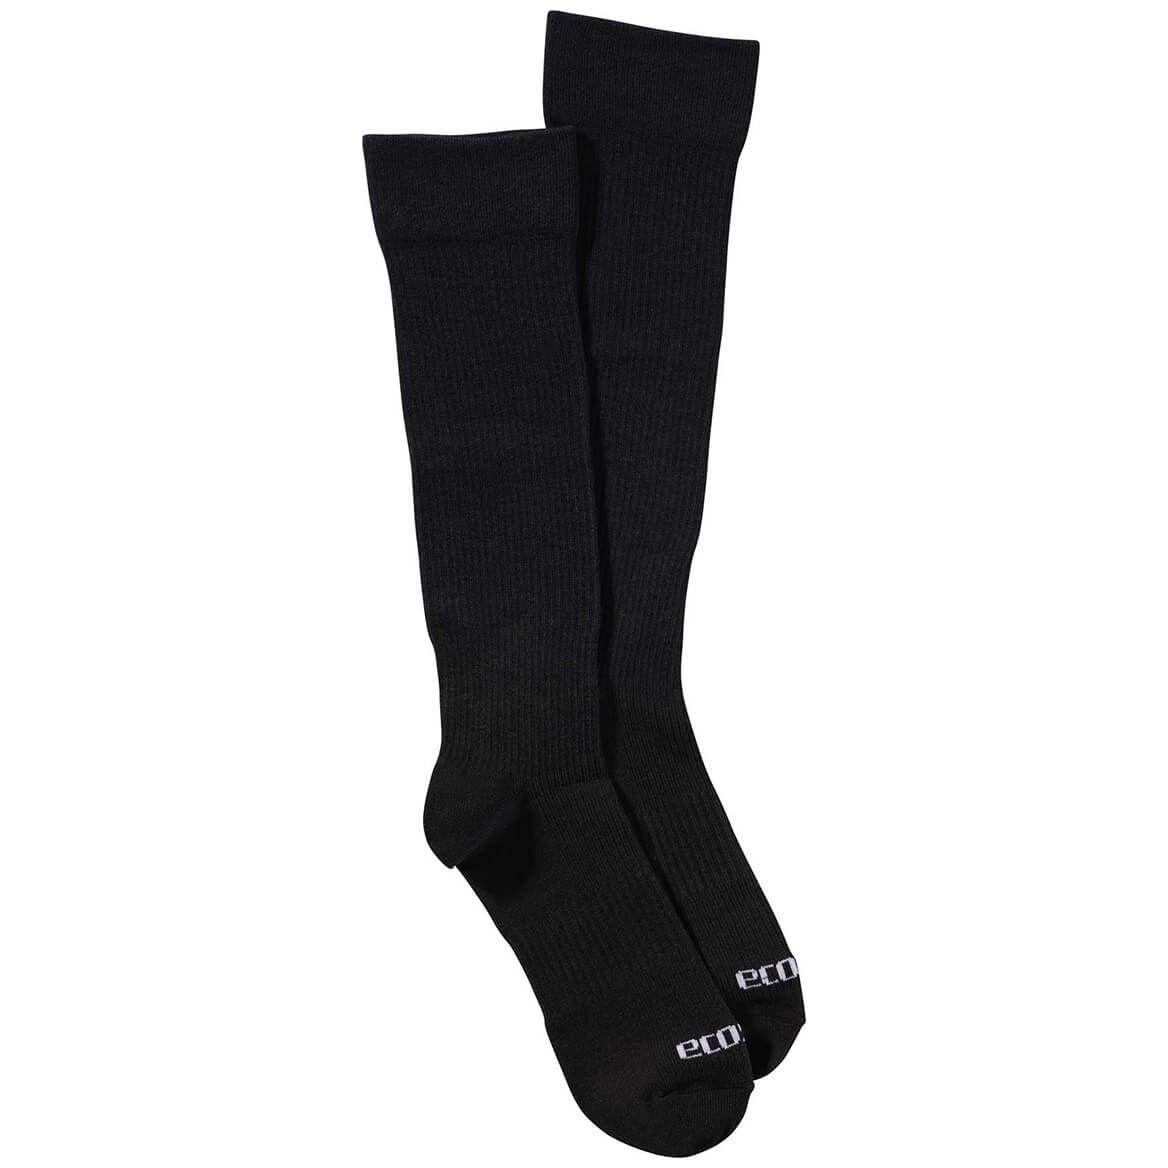 ECOSOX® Bamboo Compression Socks-344771